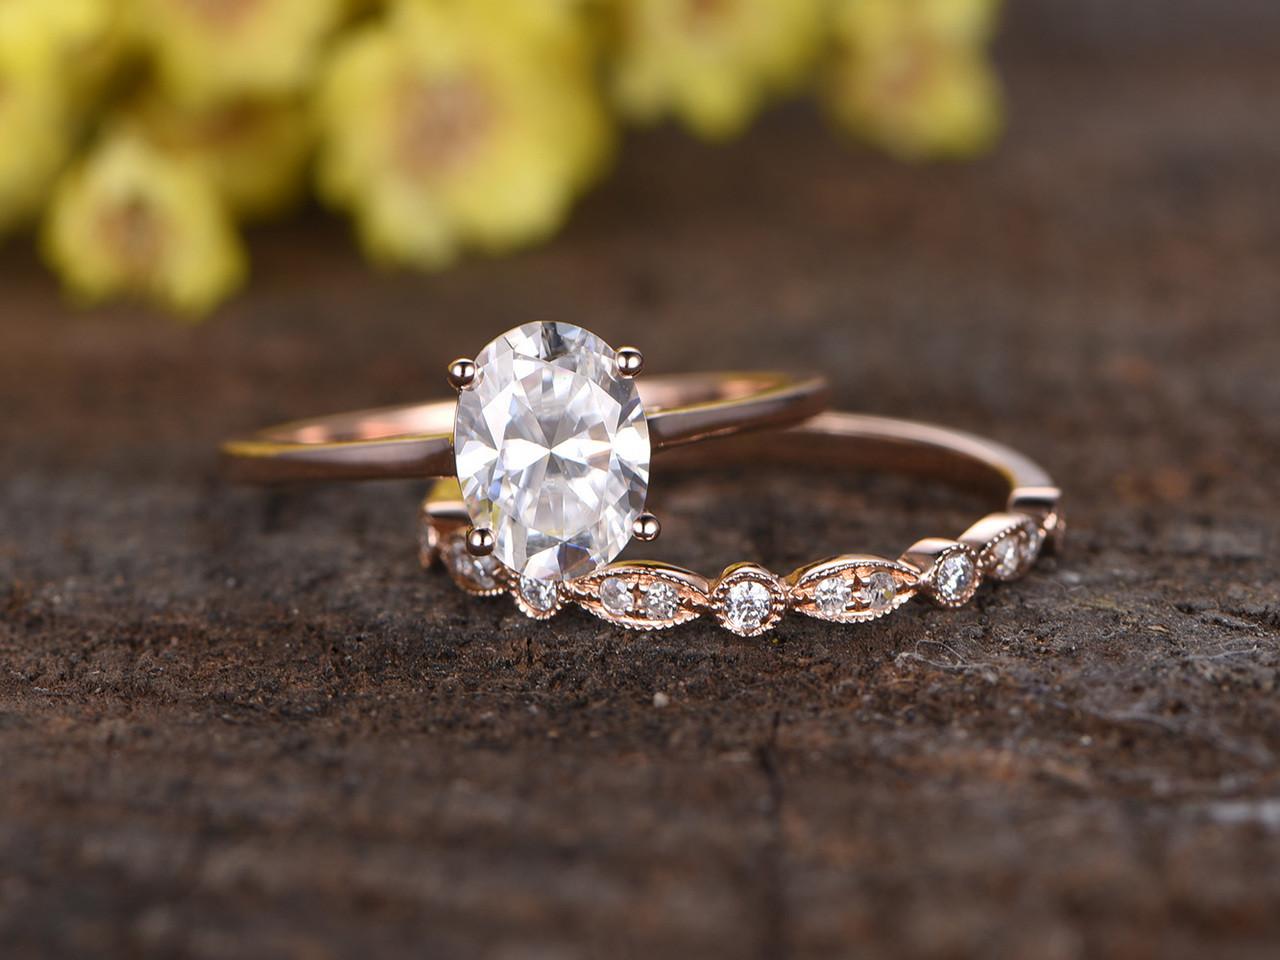 15 Carat Moissanite Solitaire Engagement Ring Set Diamond Wedding Band 14k  White Gold Art Deco Milgrain